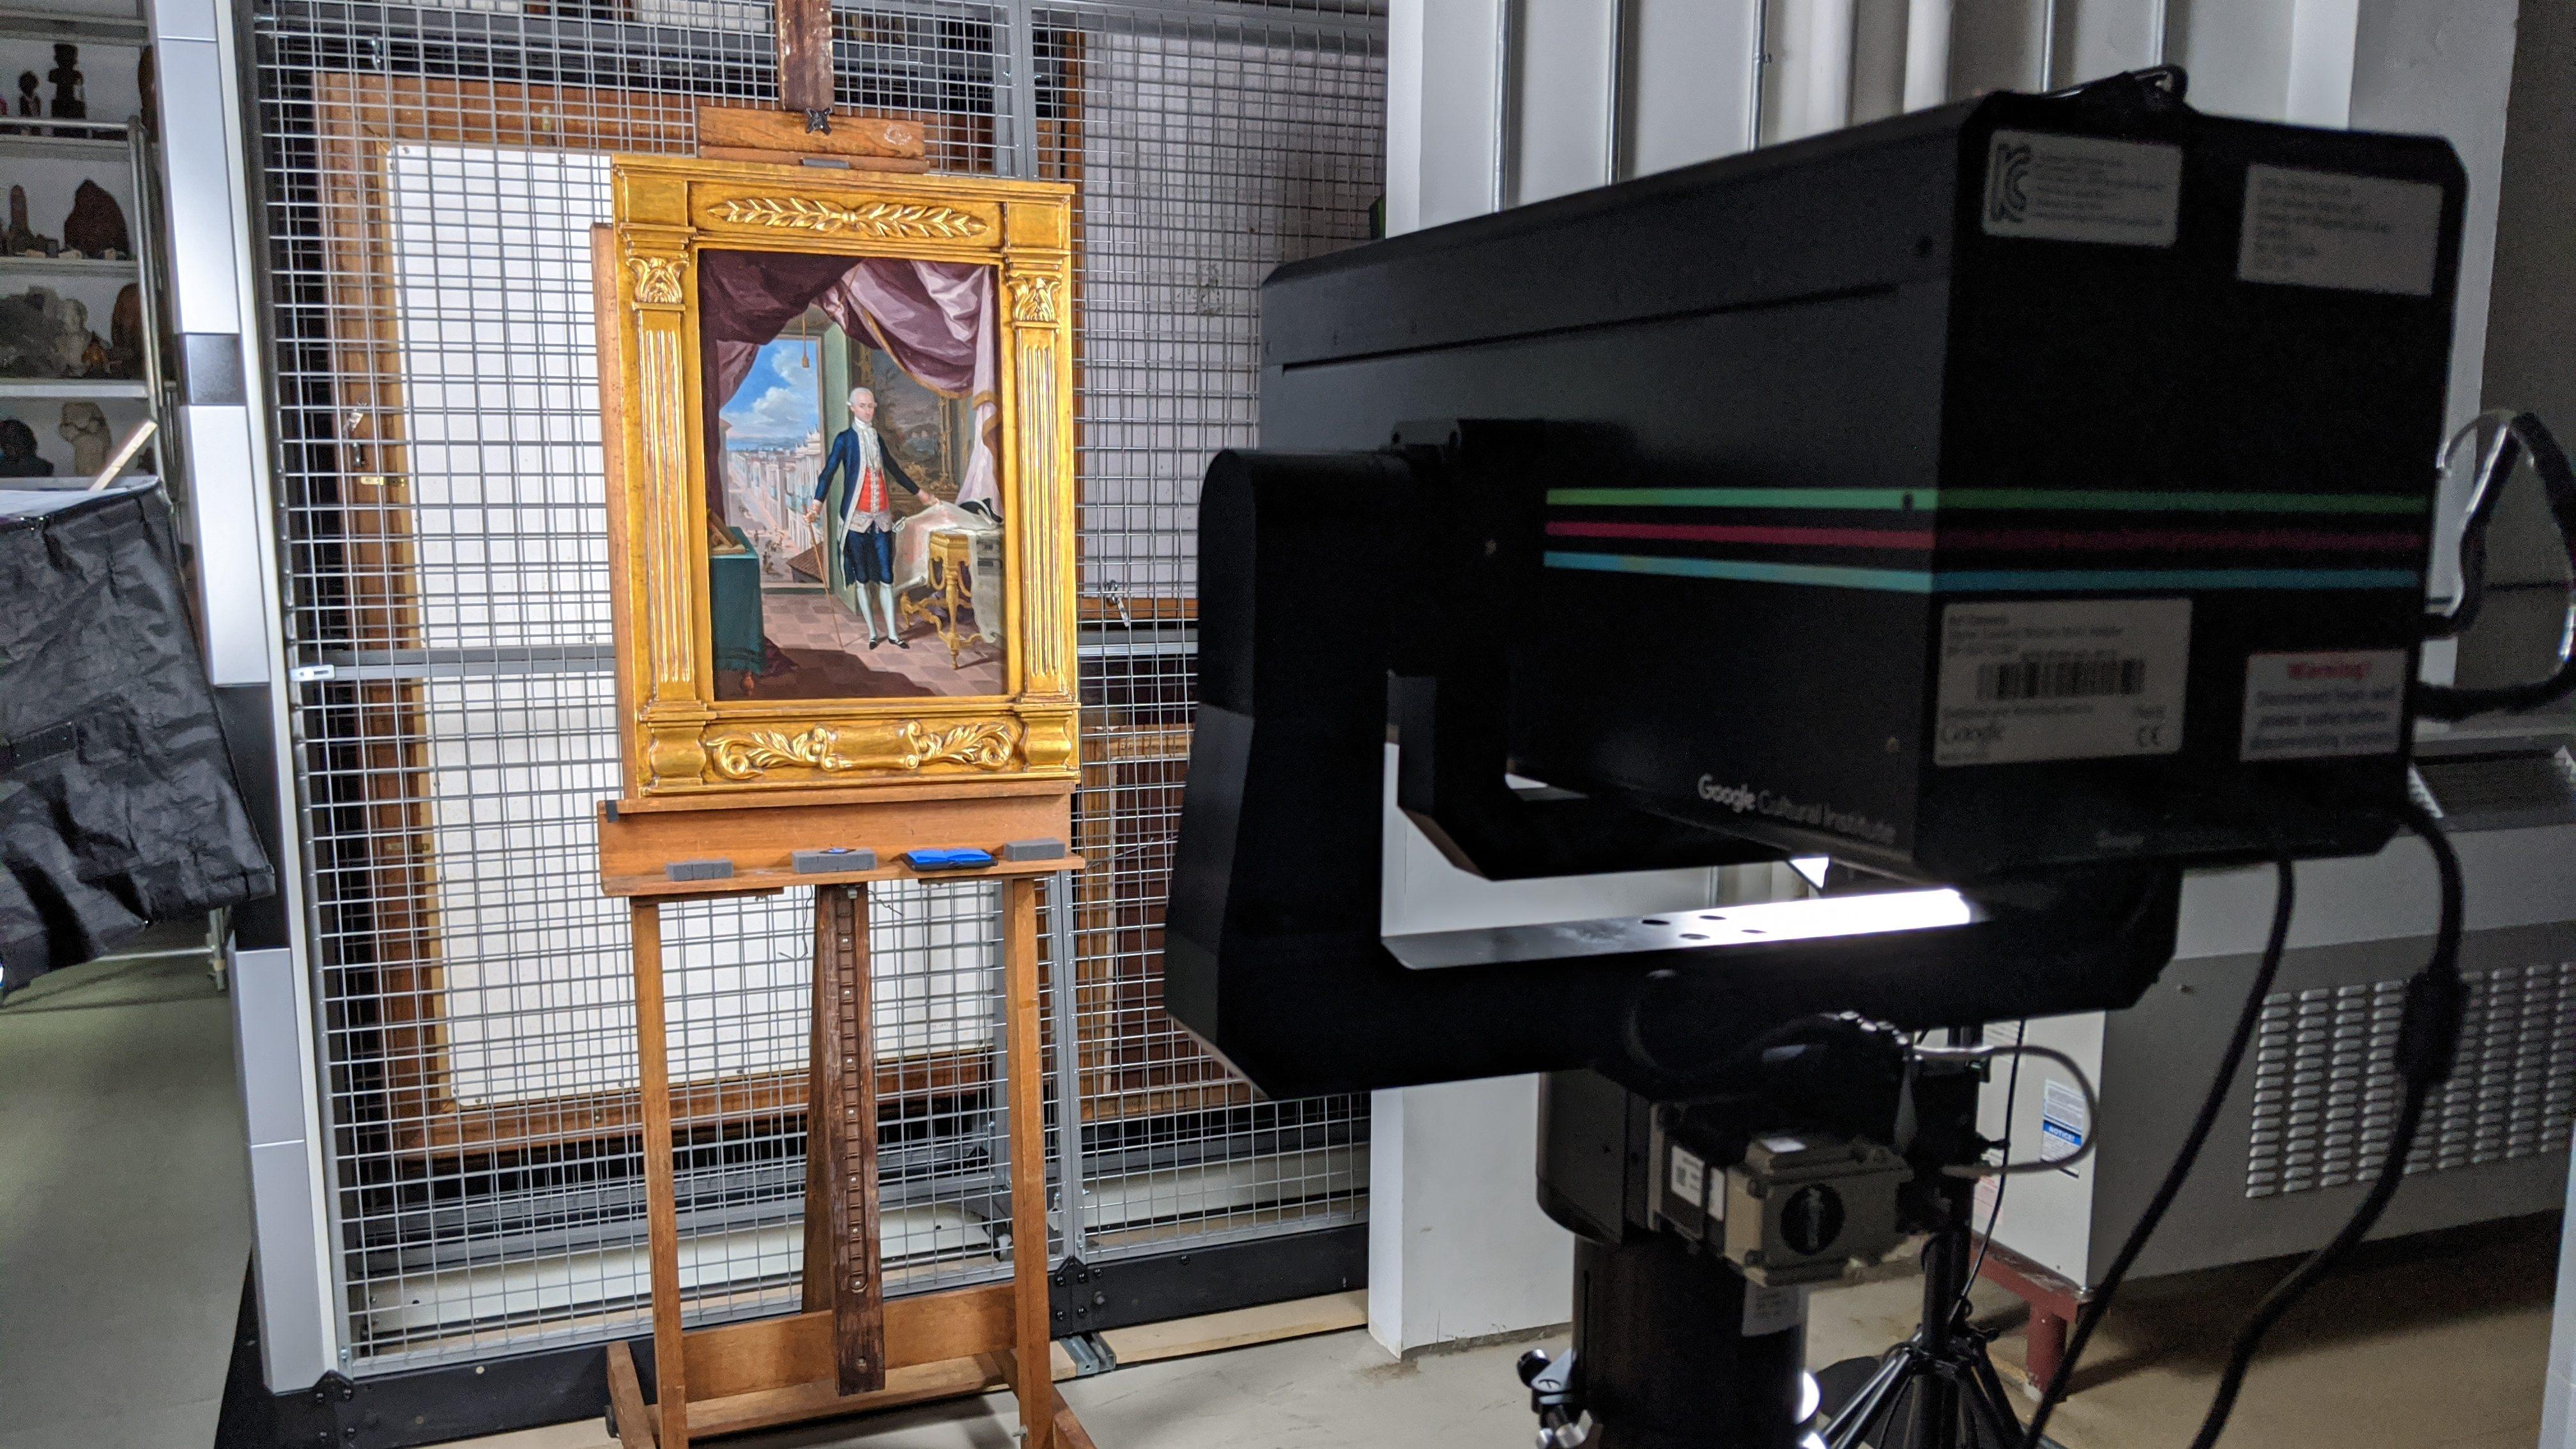 Google and Lin-Miranda Manuel partner to digitize artworks in Puerto Rico